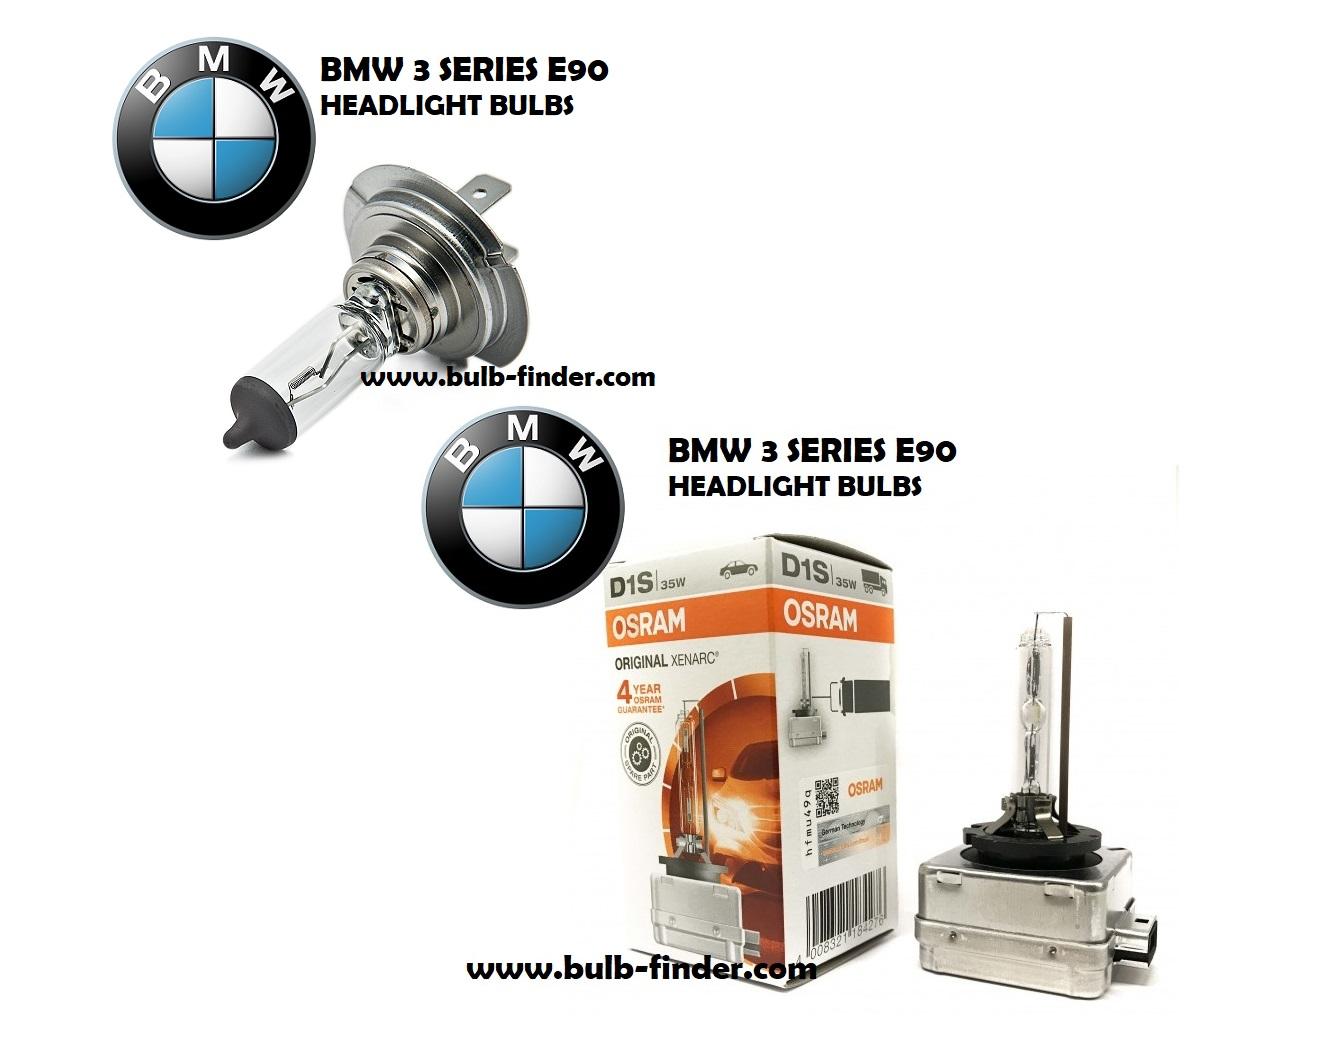 BMW 3 Series E90 headlight bulbs models